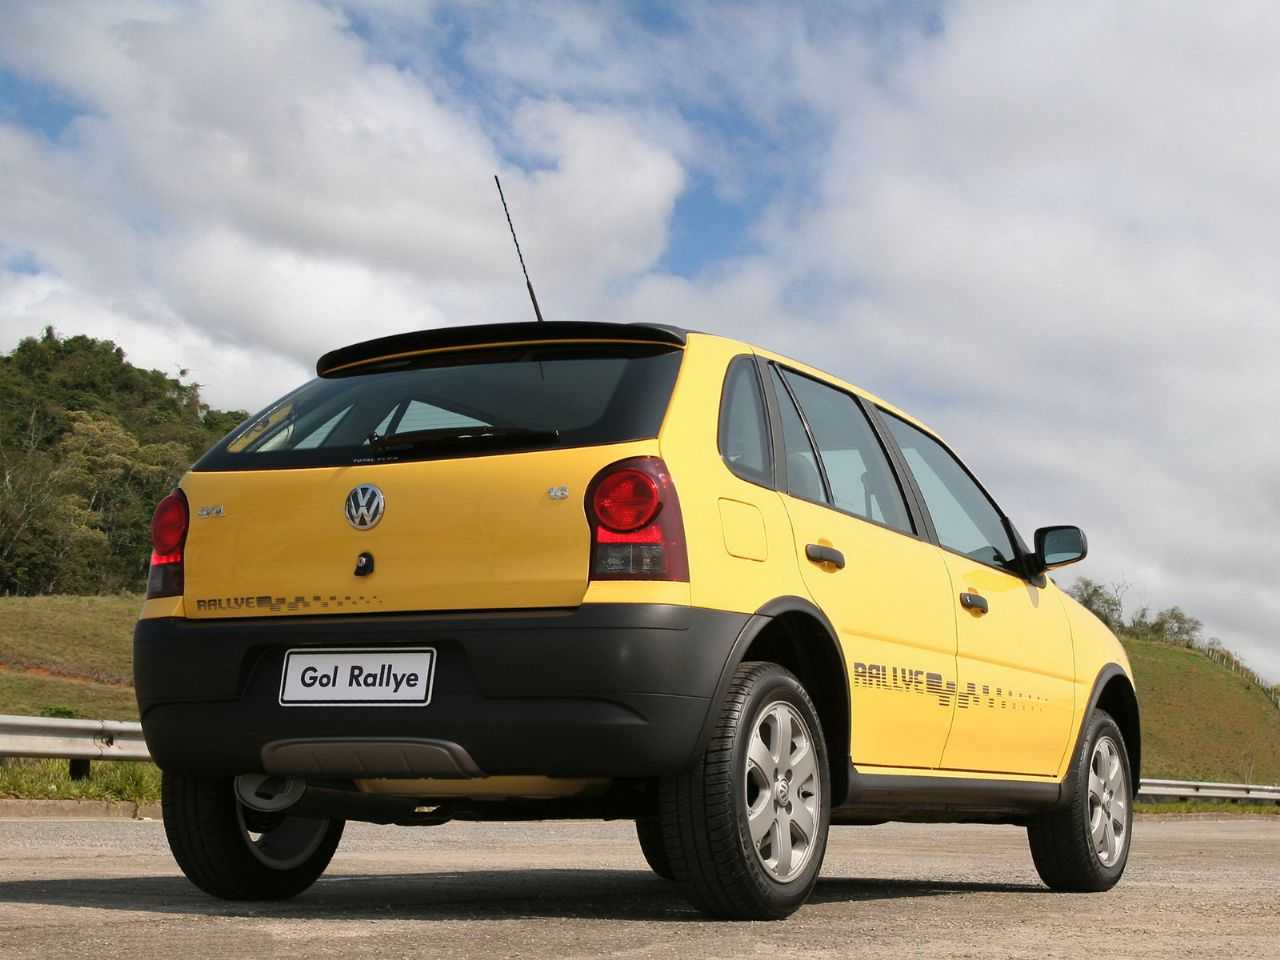 VolkswagenGol 2005 - ângulo frontal